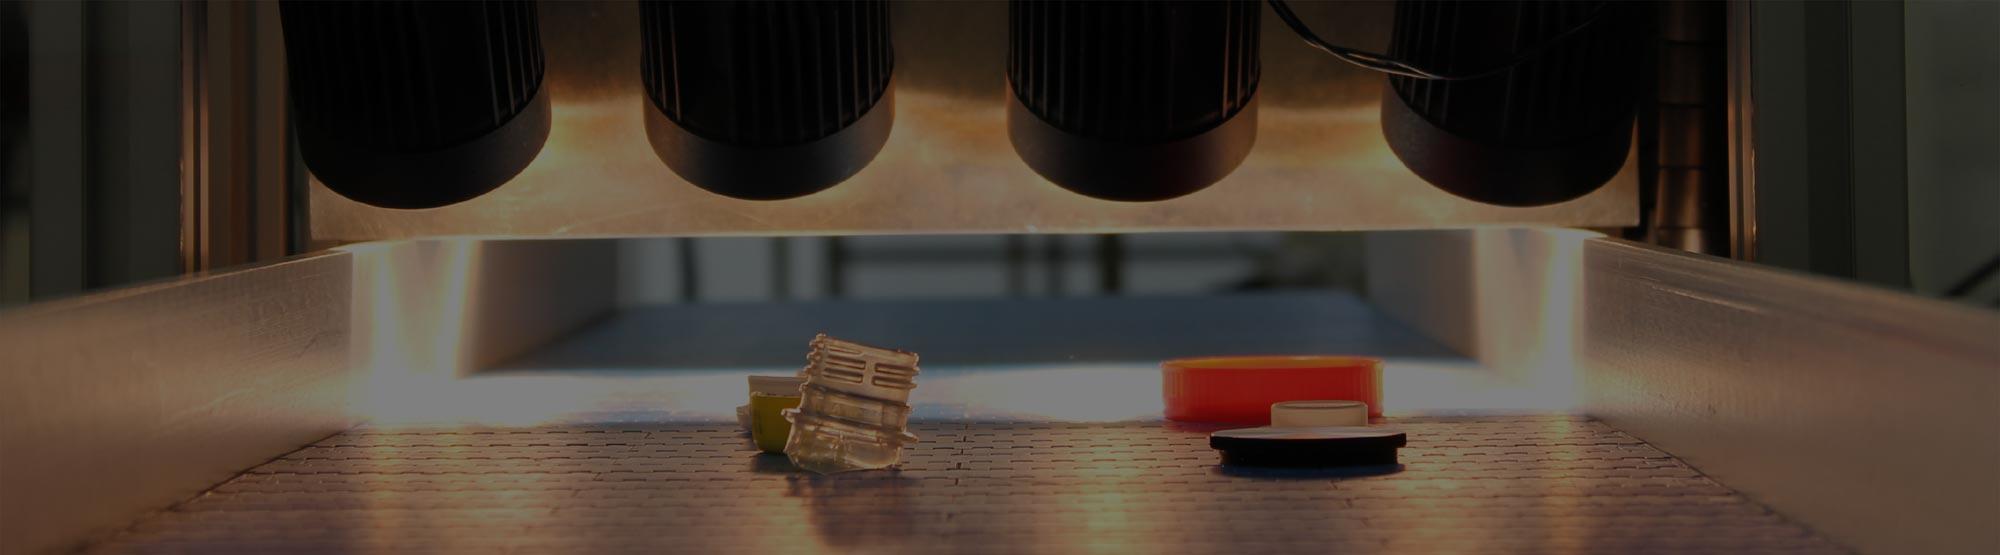 Farmacia, seguridad microbiológica